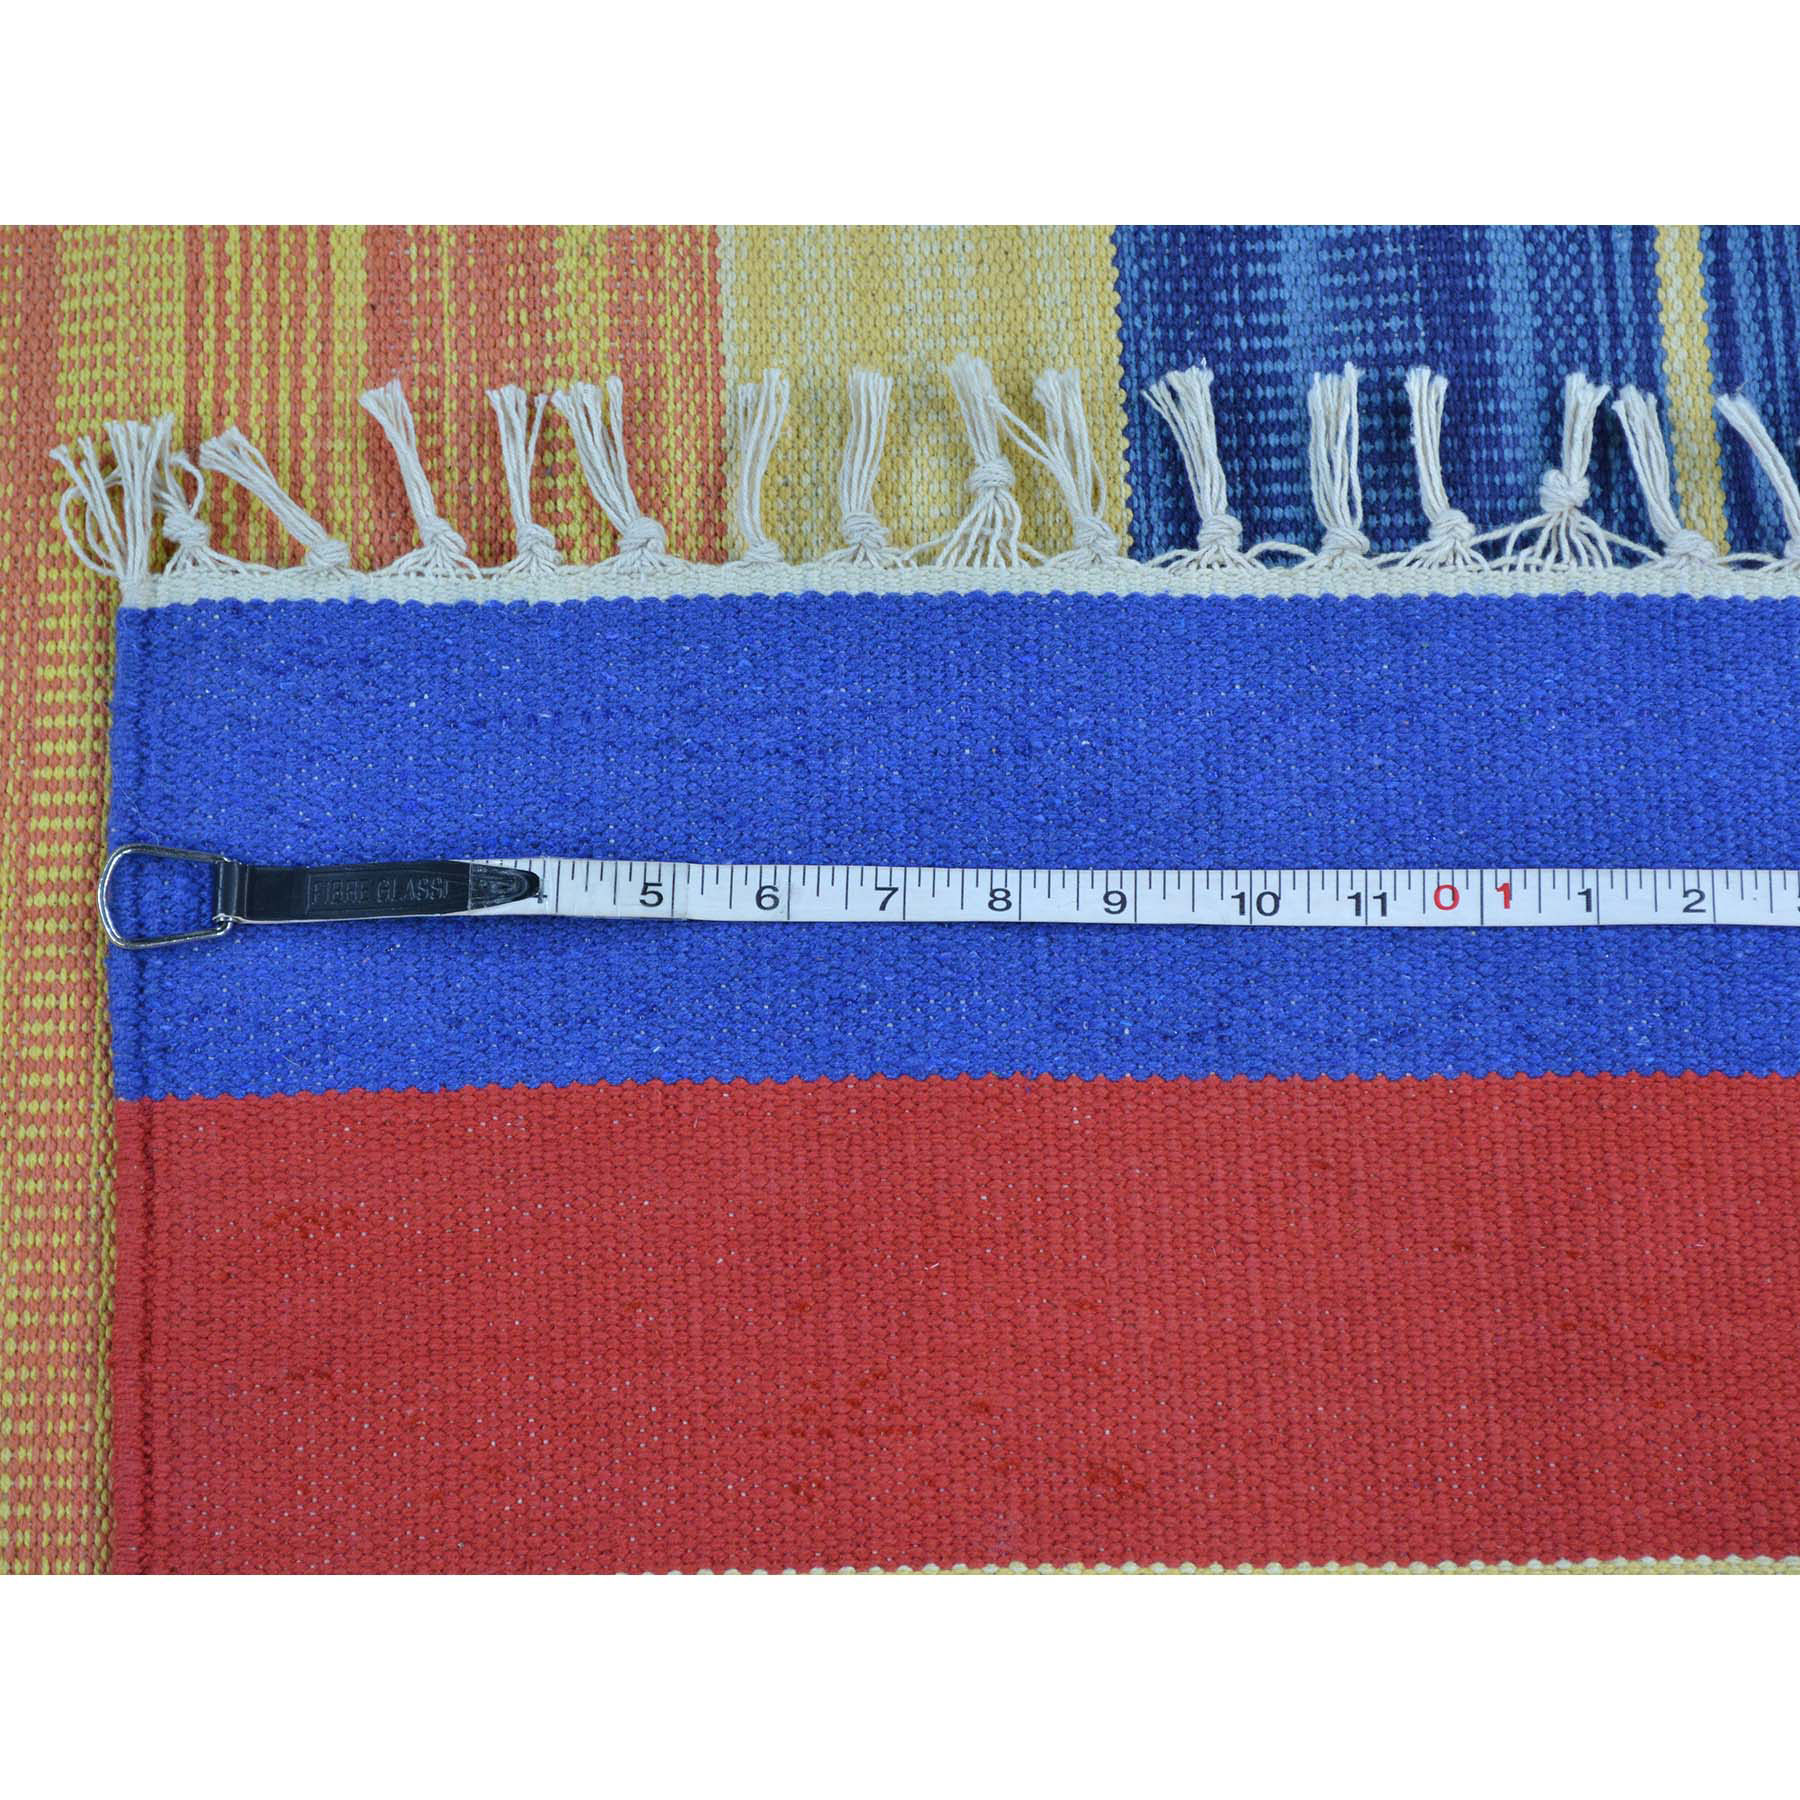 4-x6- Flat Weave Killim Hand Woven Navajo Design Rug